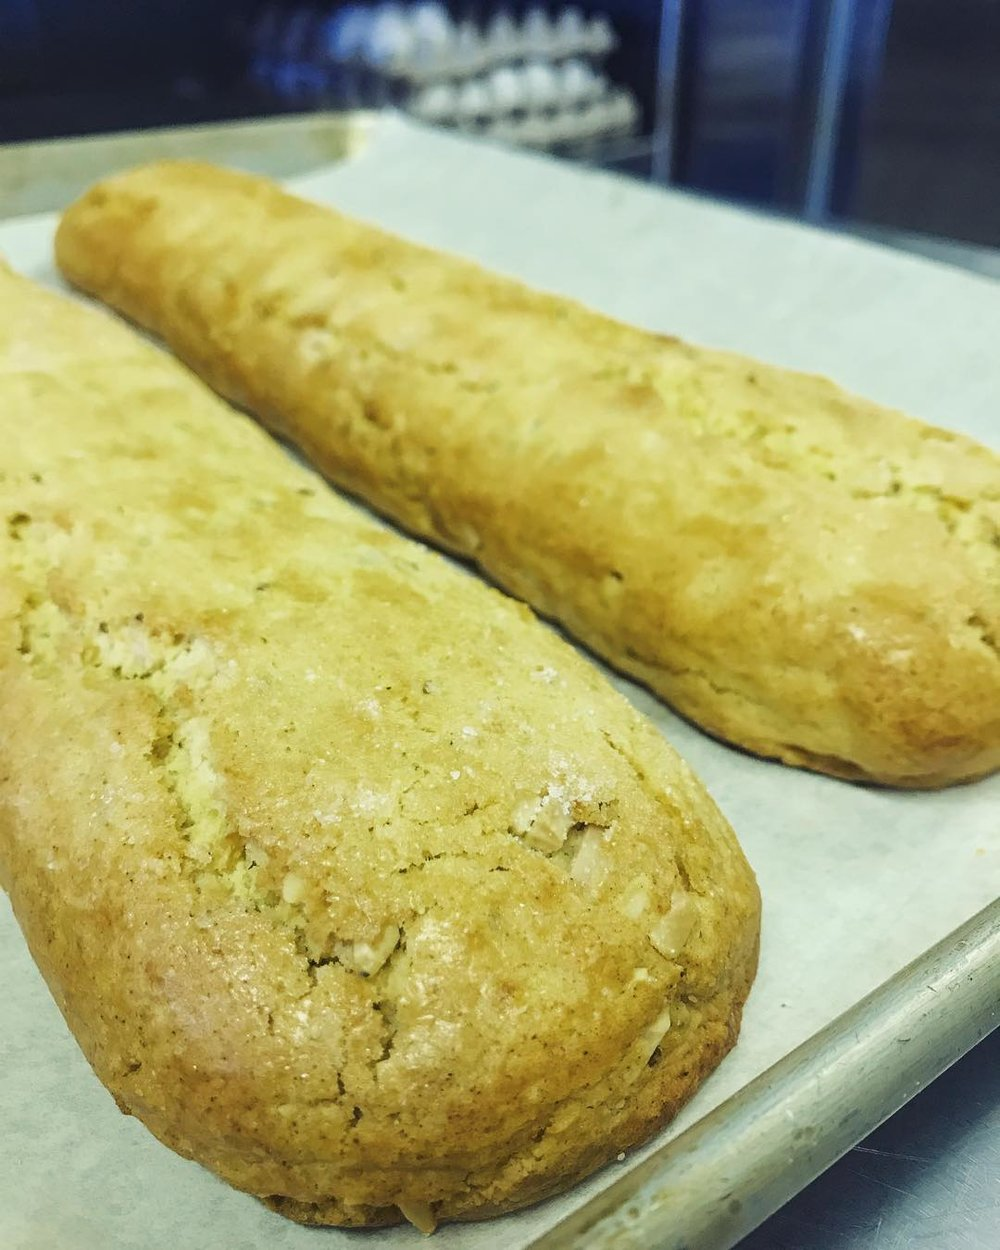 Biscotti After First Bake